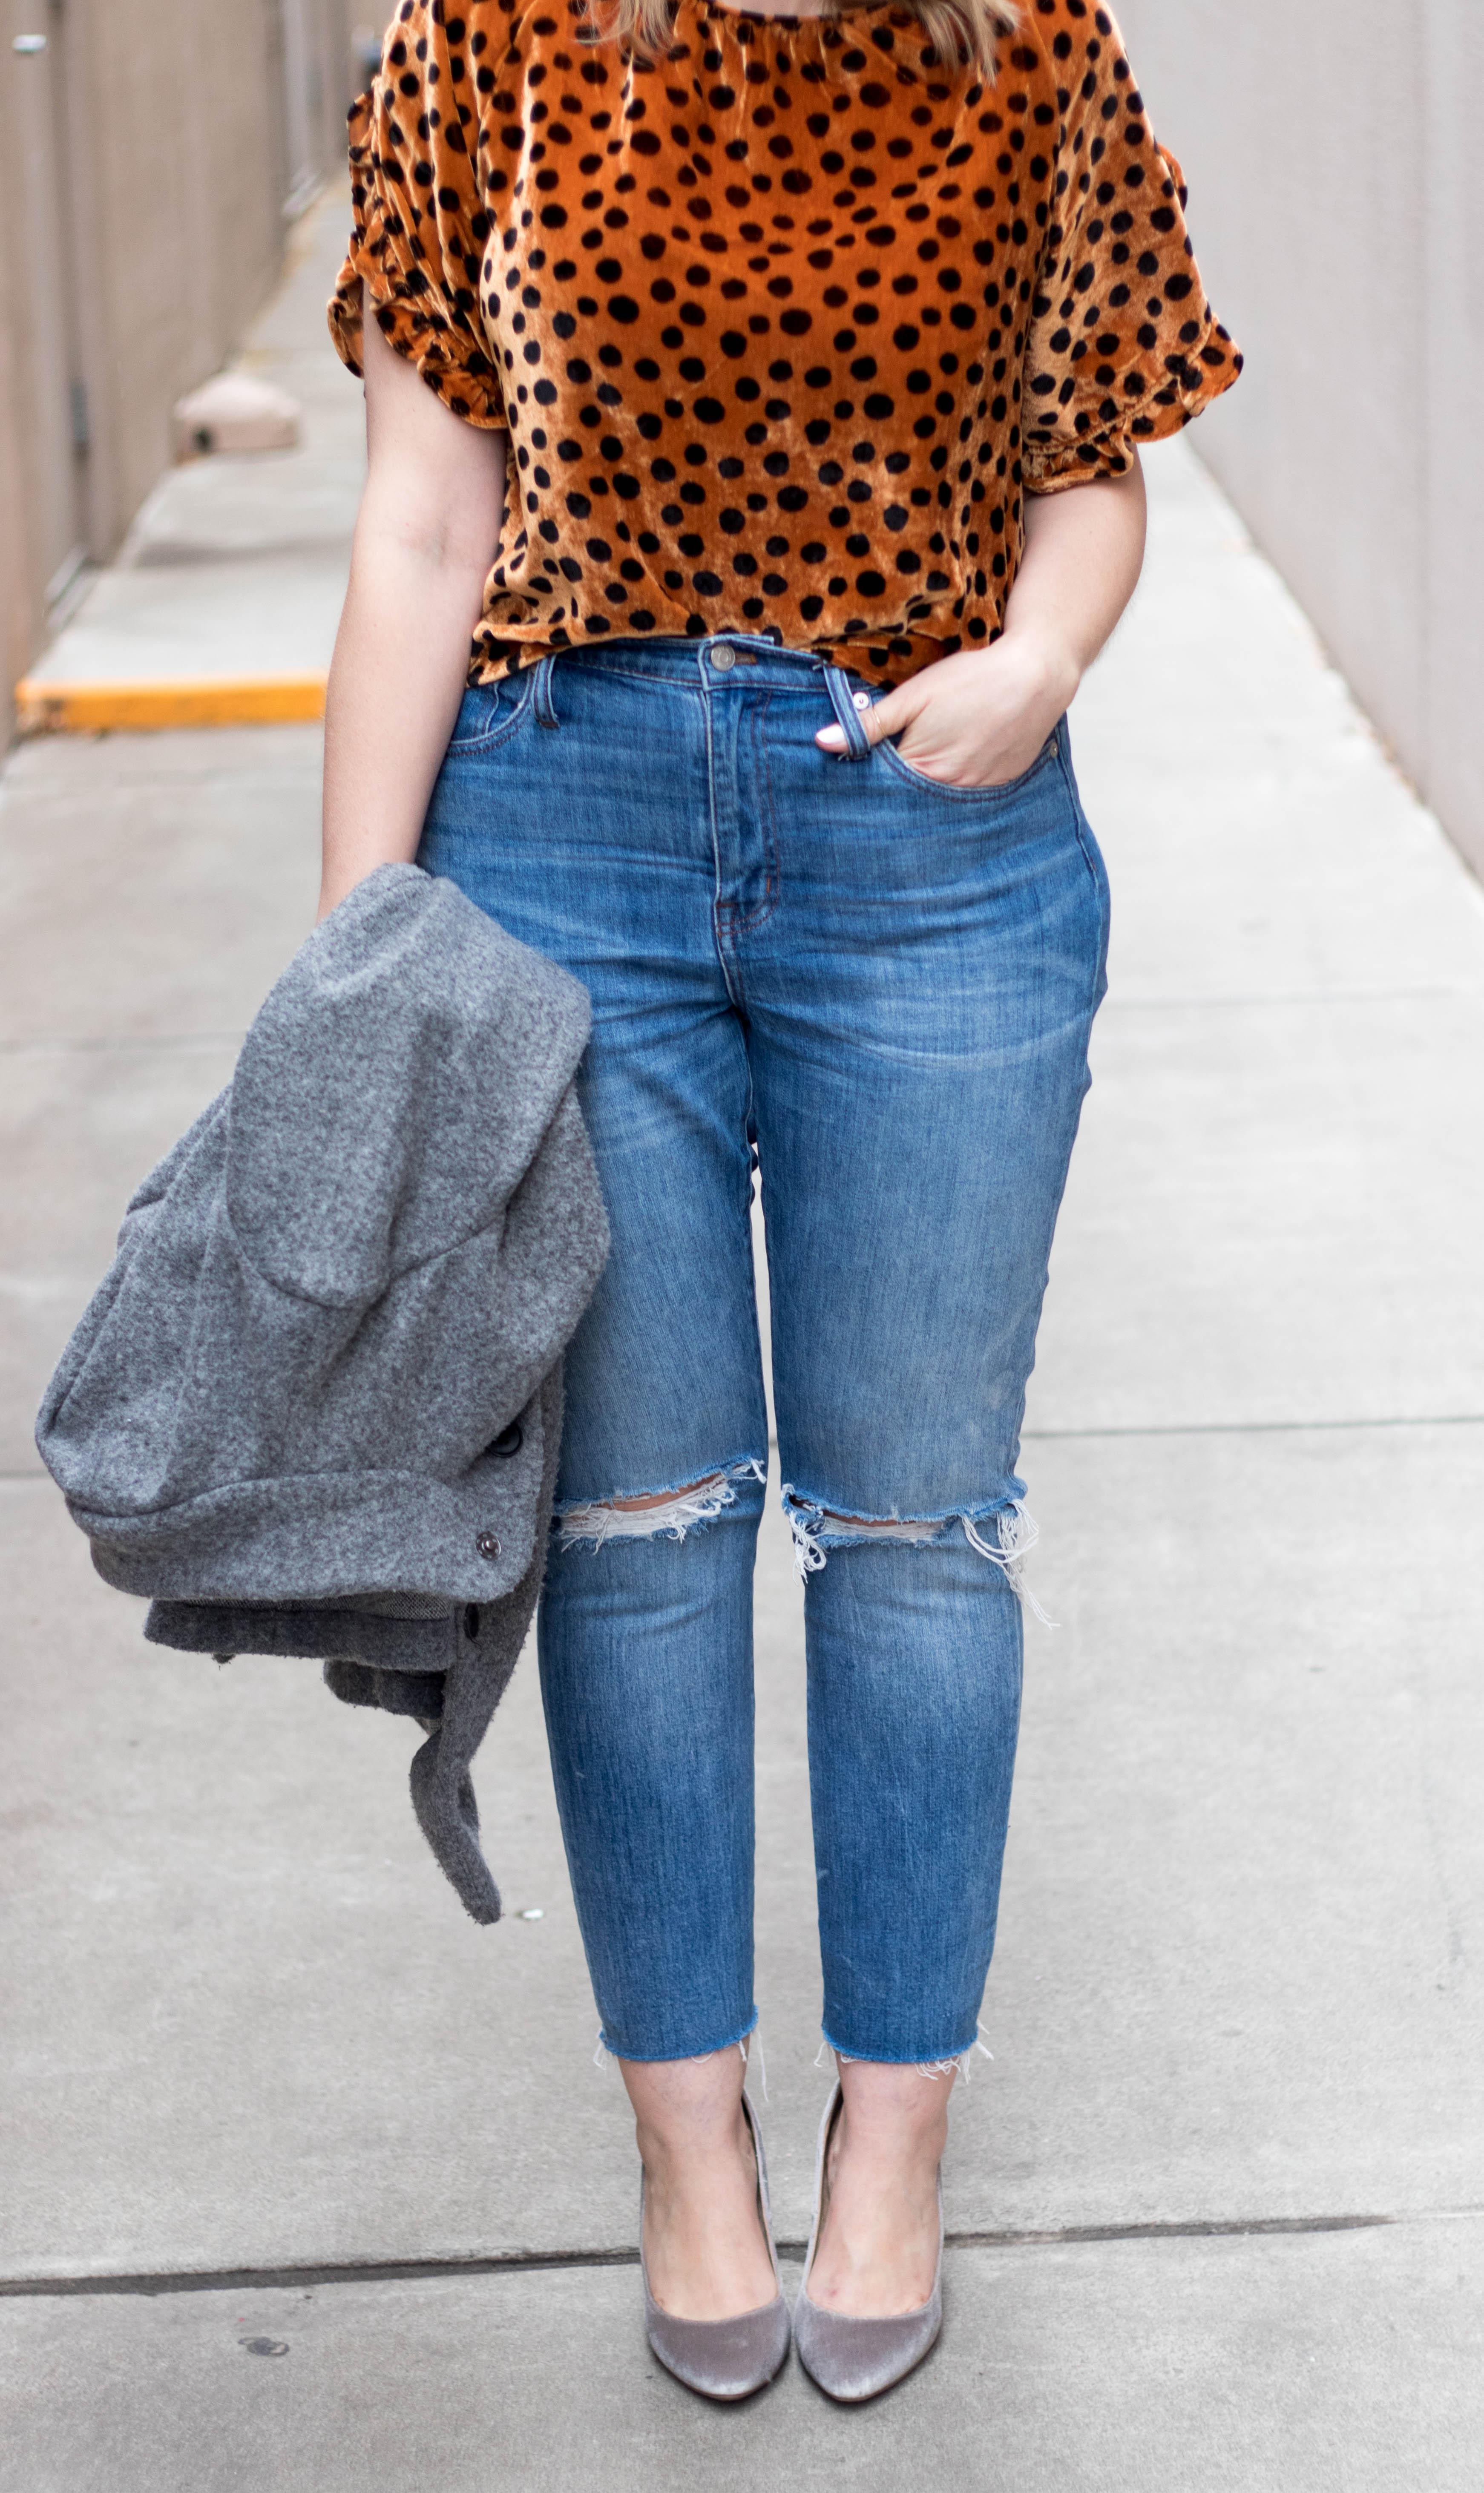 madewell high rise boyfriend jeans #boyfriendjeans #tallfashion #oldnavystyle